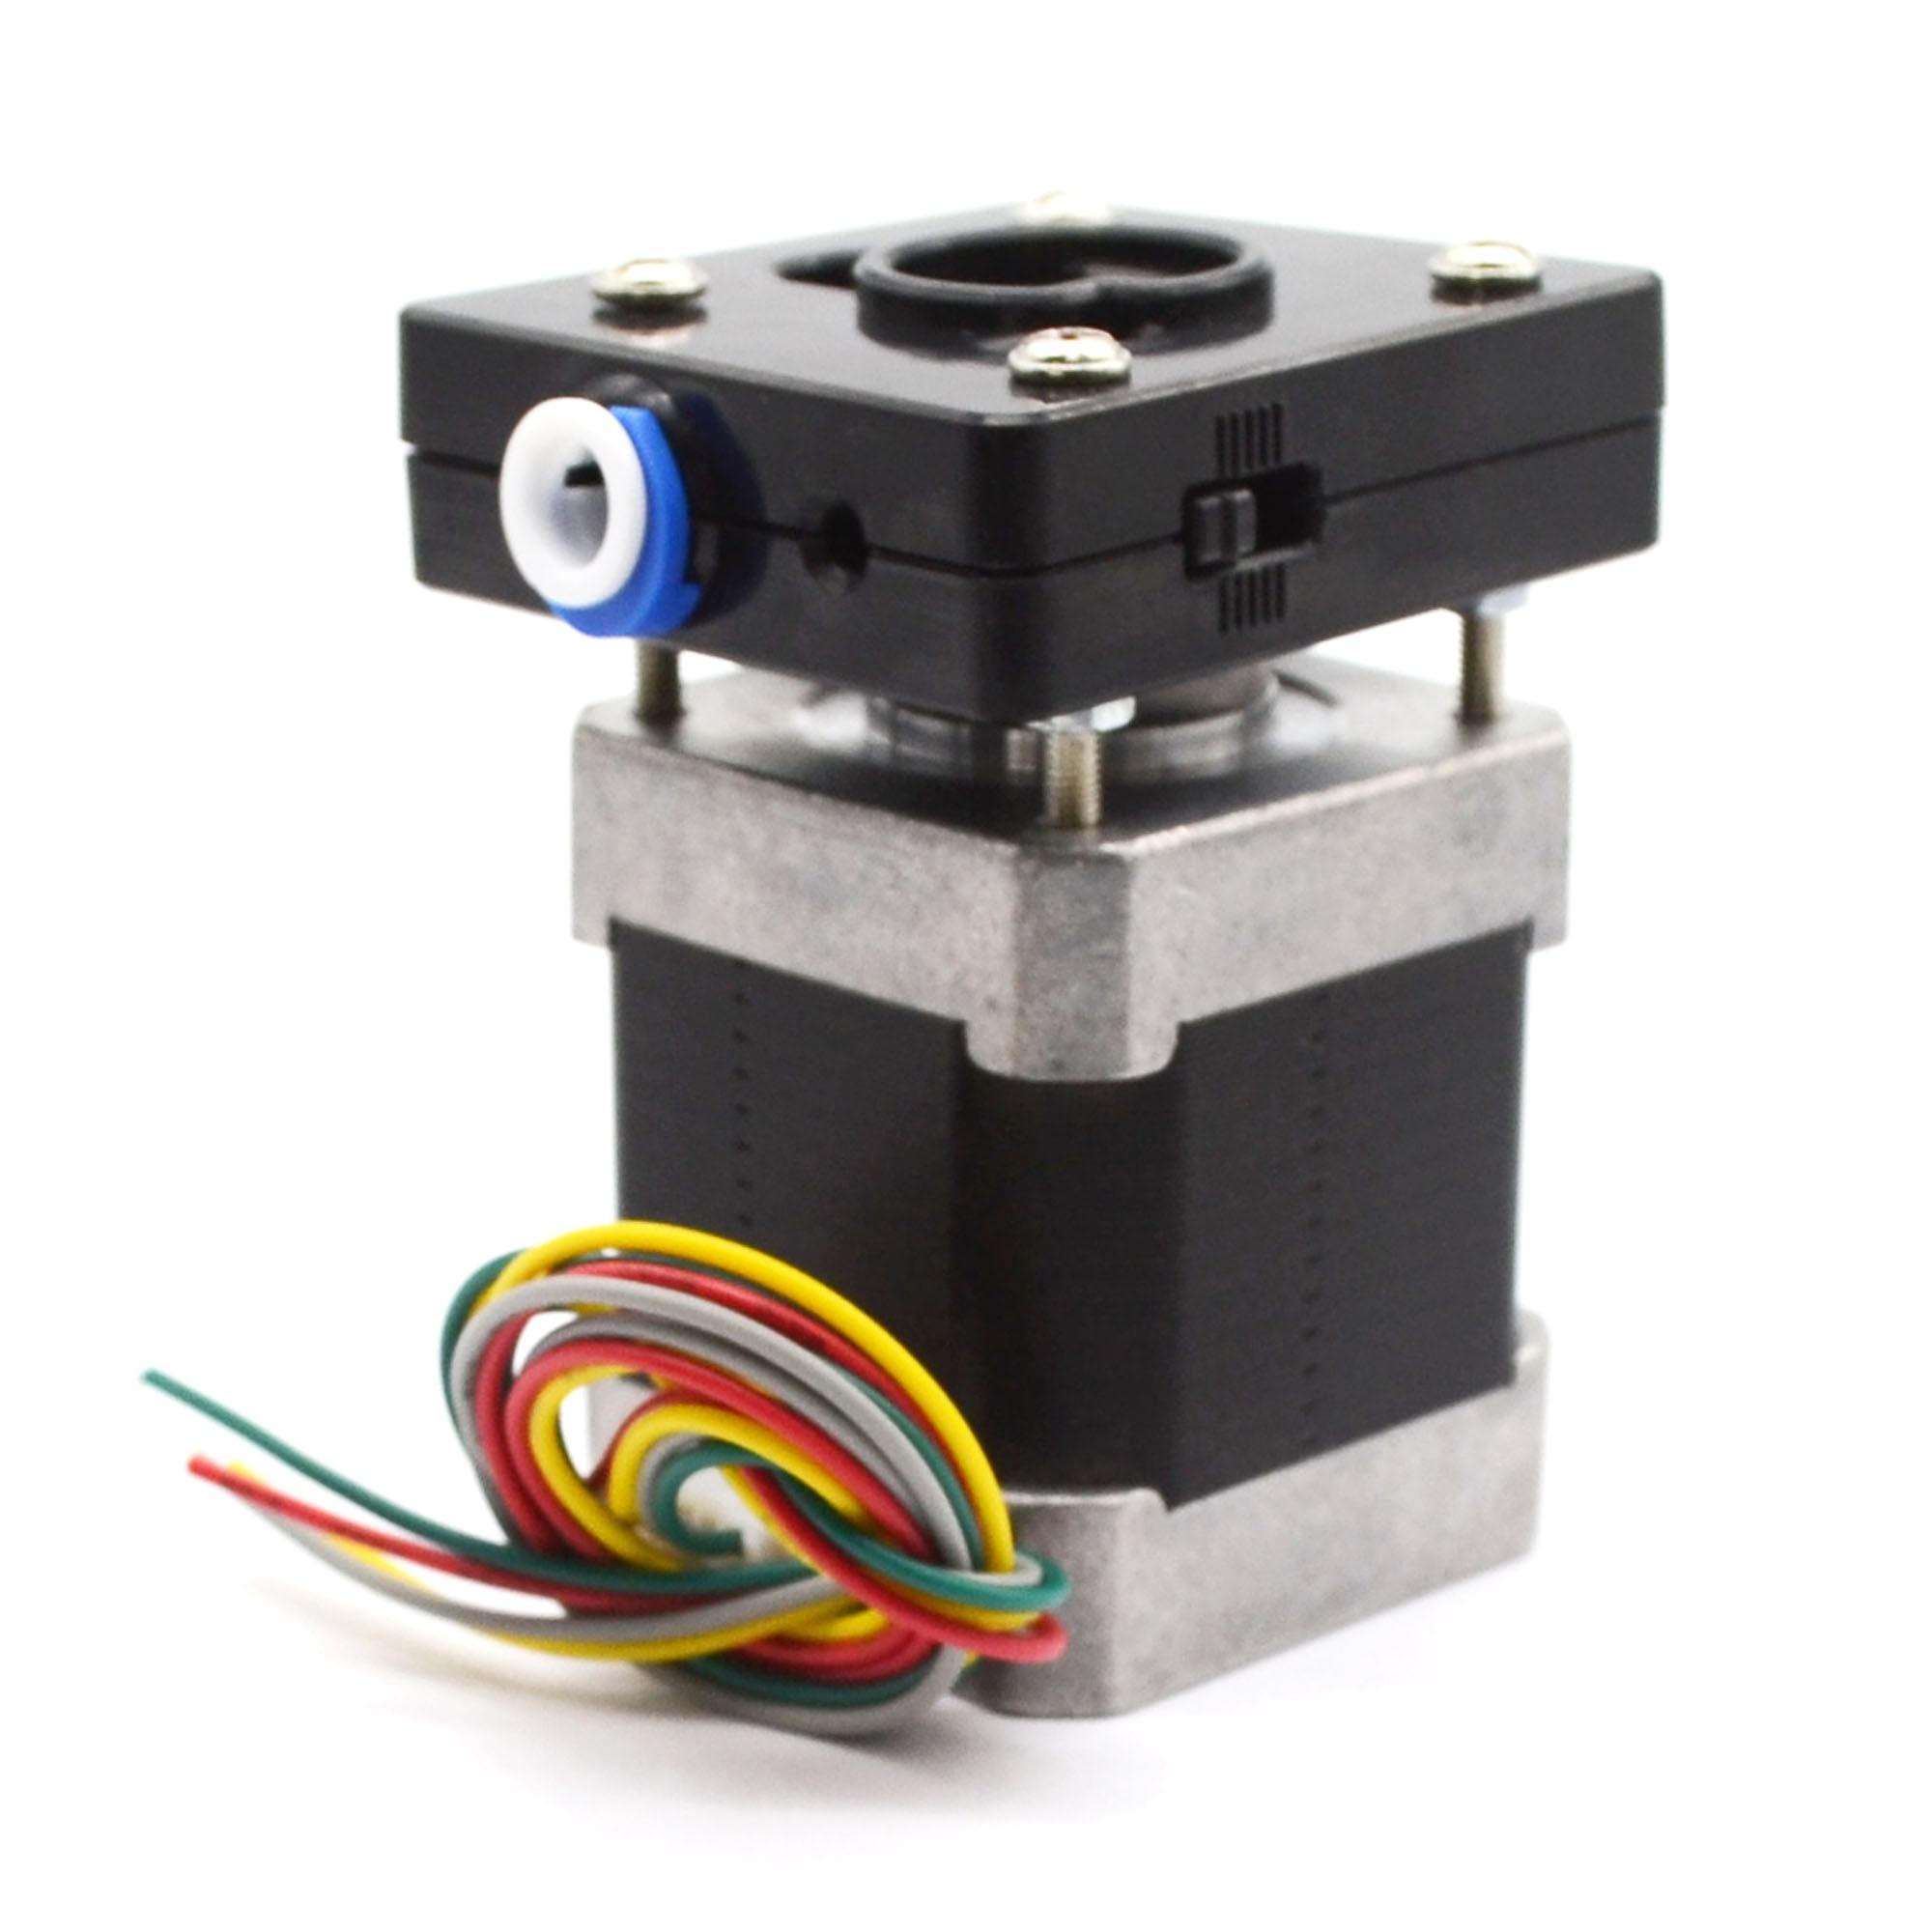 3D Printer Ultimaker 2 Bowden Extruder Feeder device with Nema 17 stepper motor For 1.75mm/3.0mm Filament UM2 Remote extruder ultimaker original bowden extruder feeder assemble kit set for diy 3d printer parts for 3 mm filament